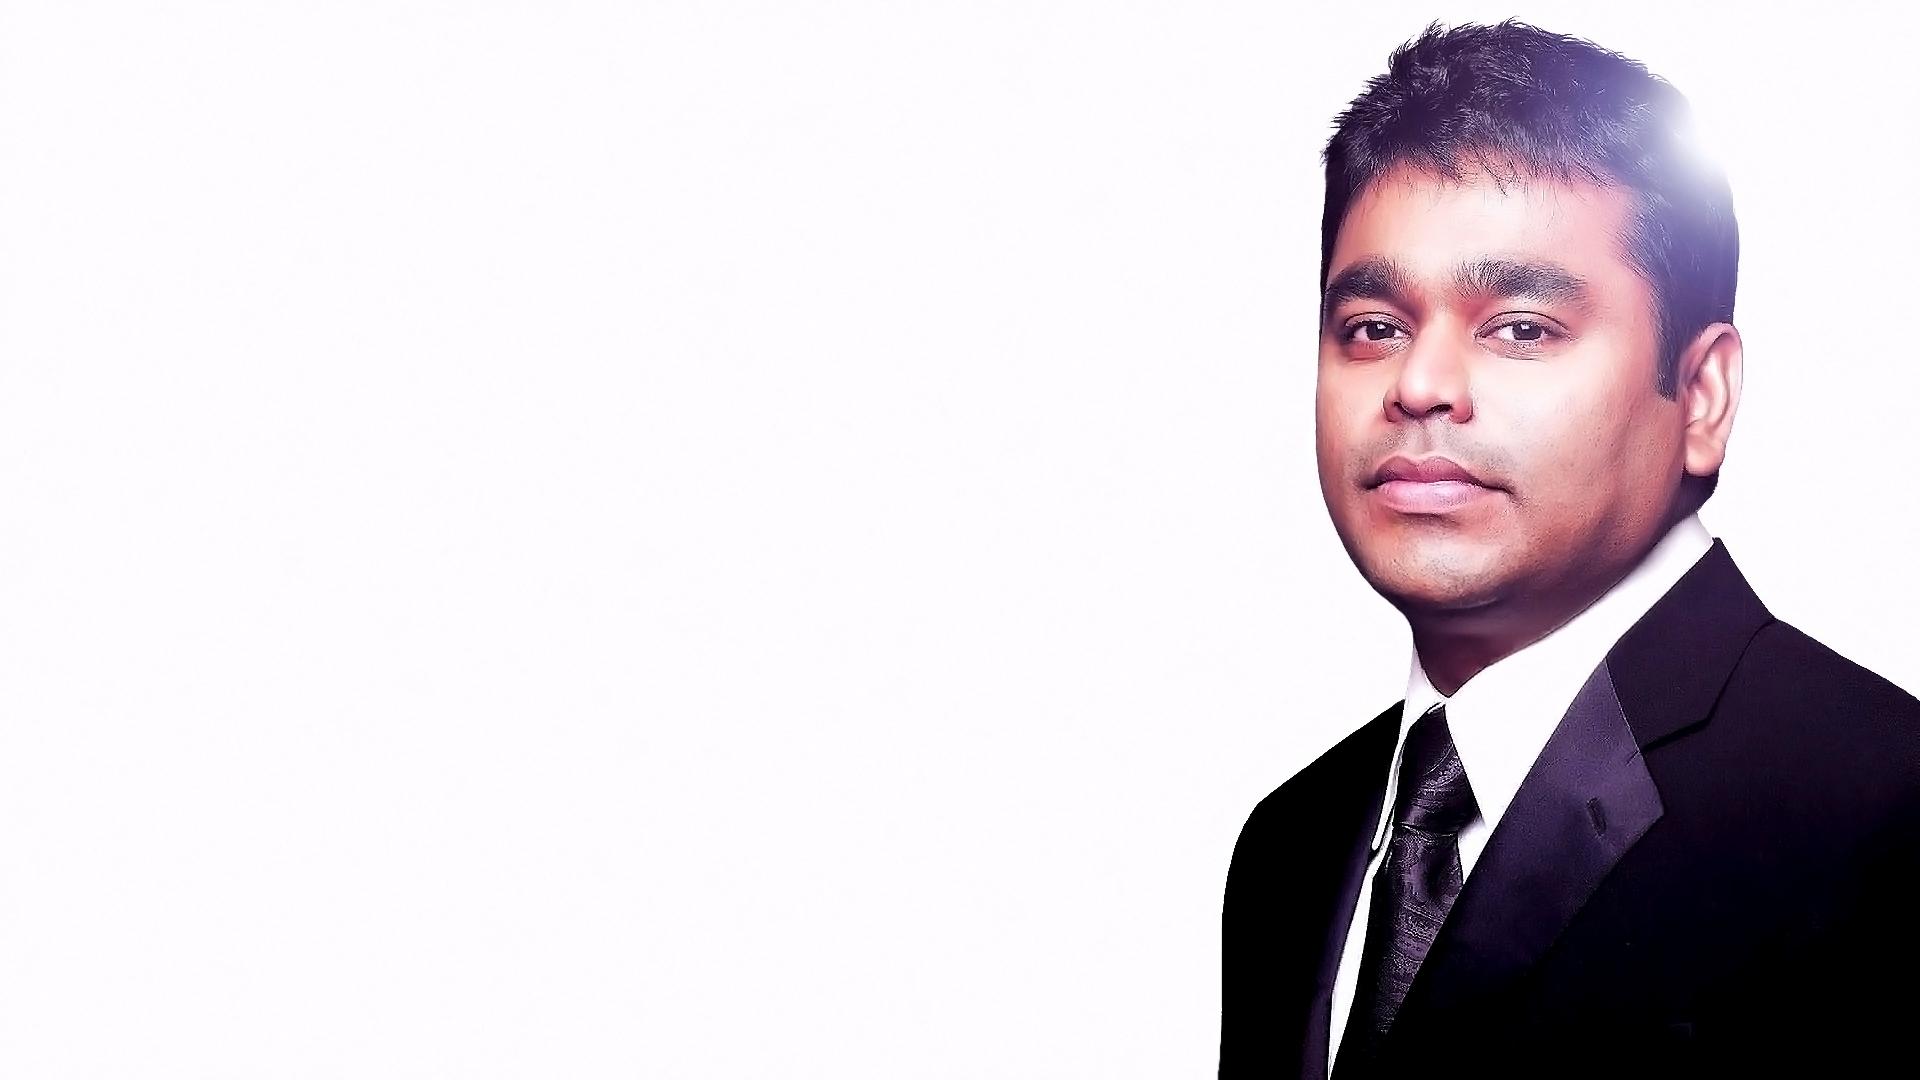 A.R.Rahman By Ramlive On DeviantArt